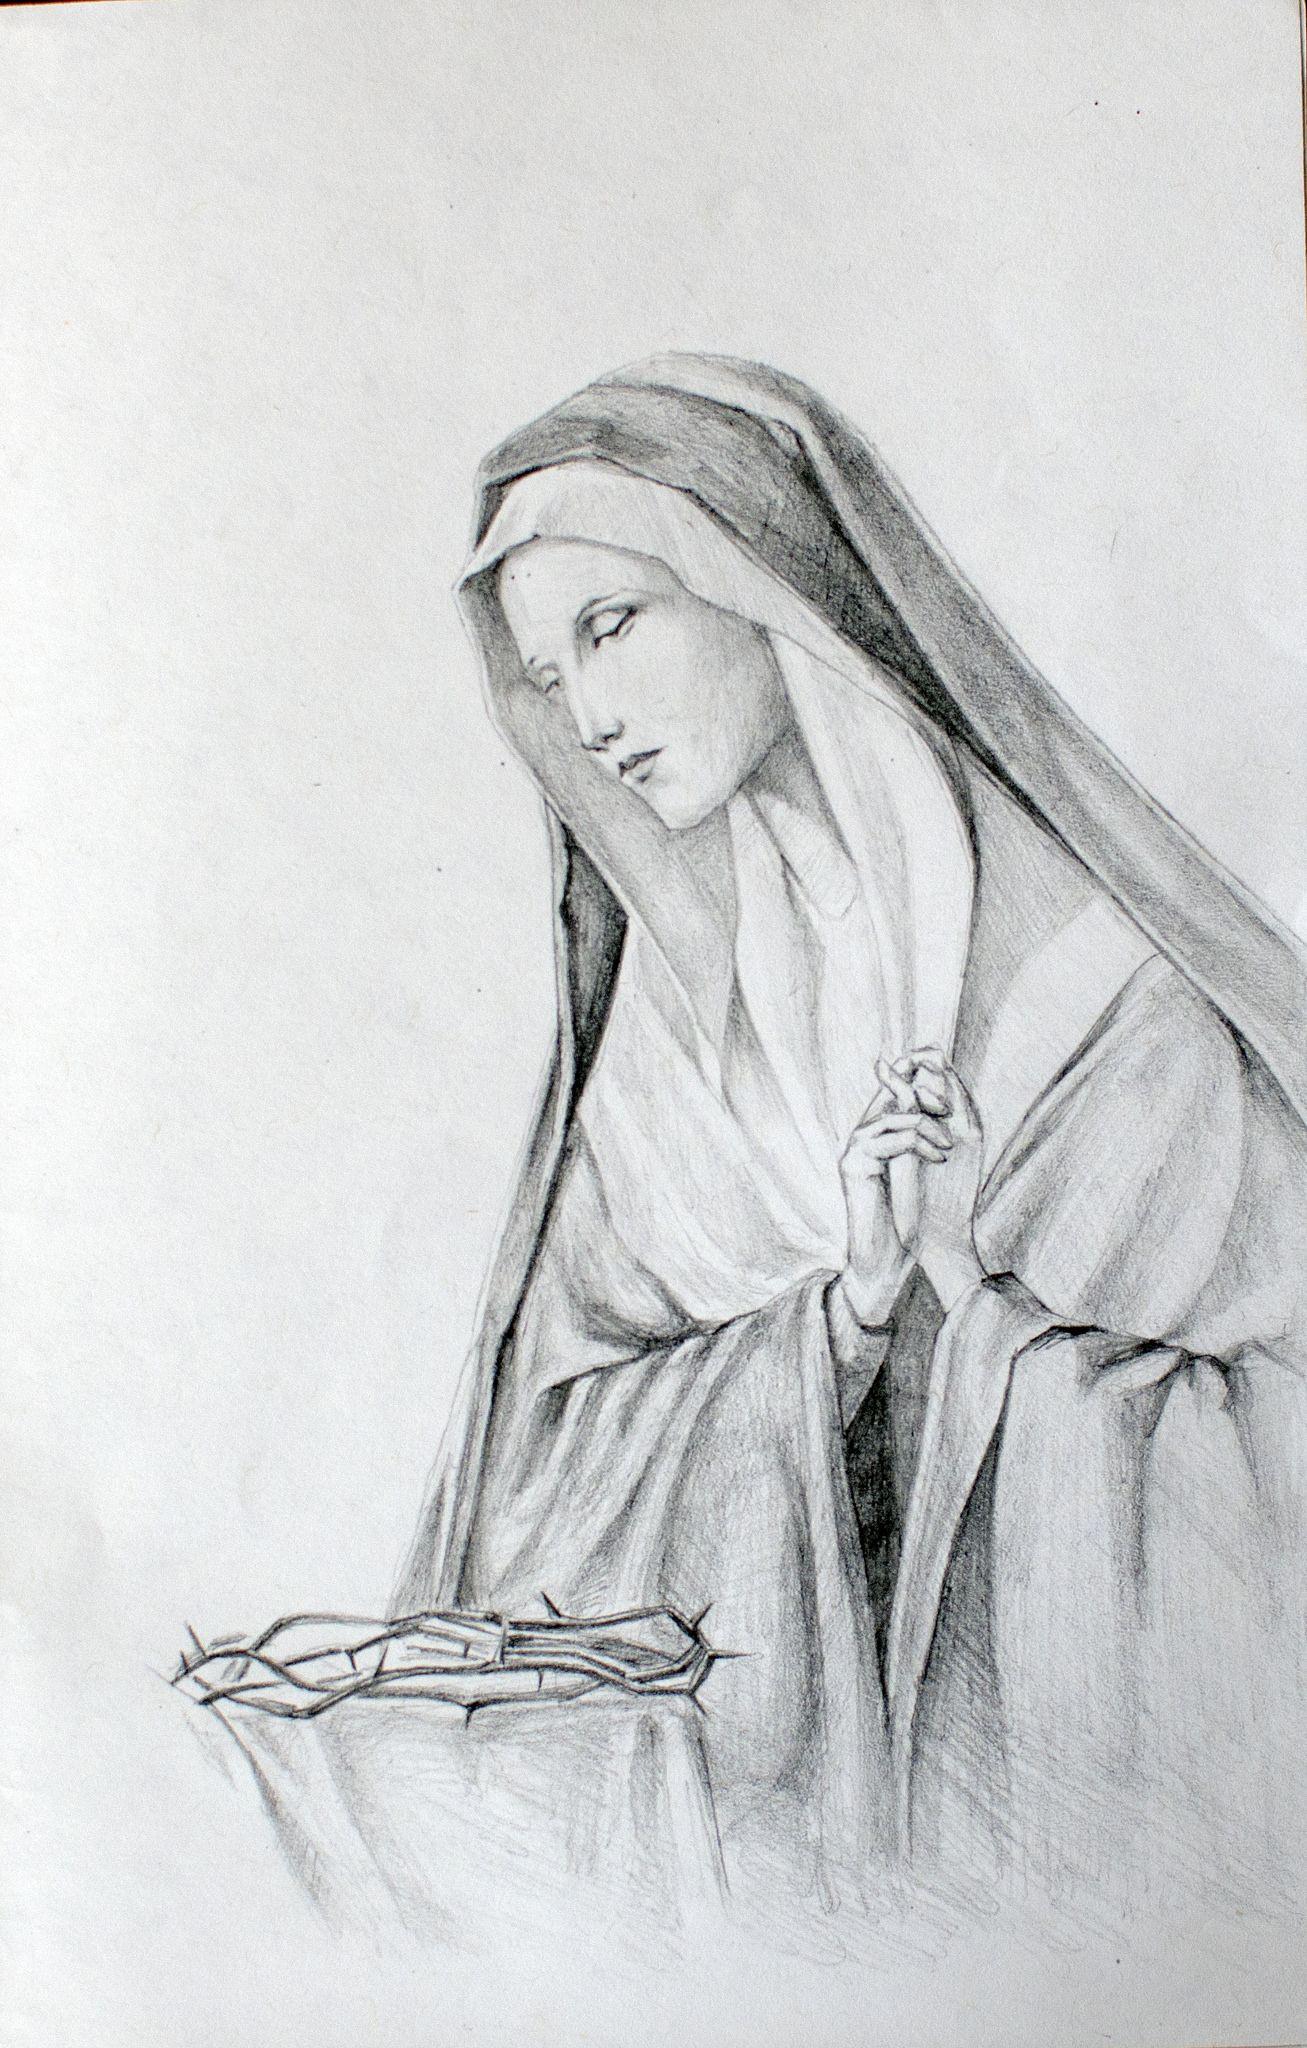 https://flic.kr/p/EXpvqY | Virgin Mary, pencil portrait by Kirillnbb